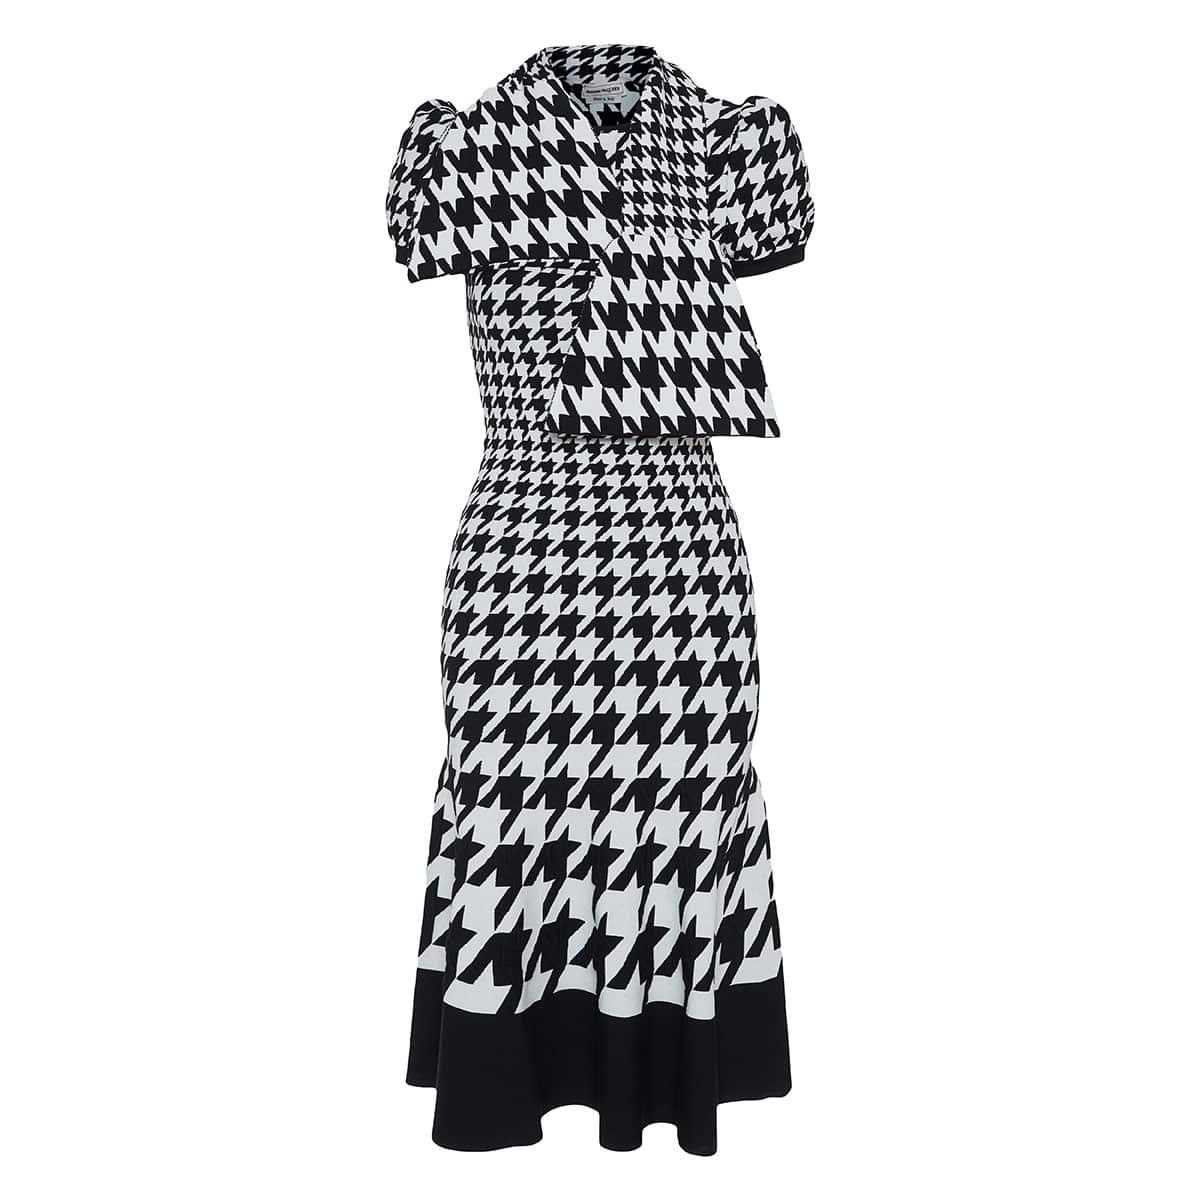 Neck-tie dogtooth jacquard-knit midi dress